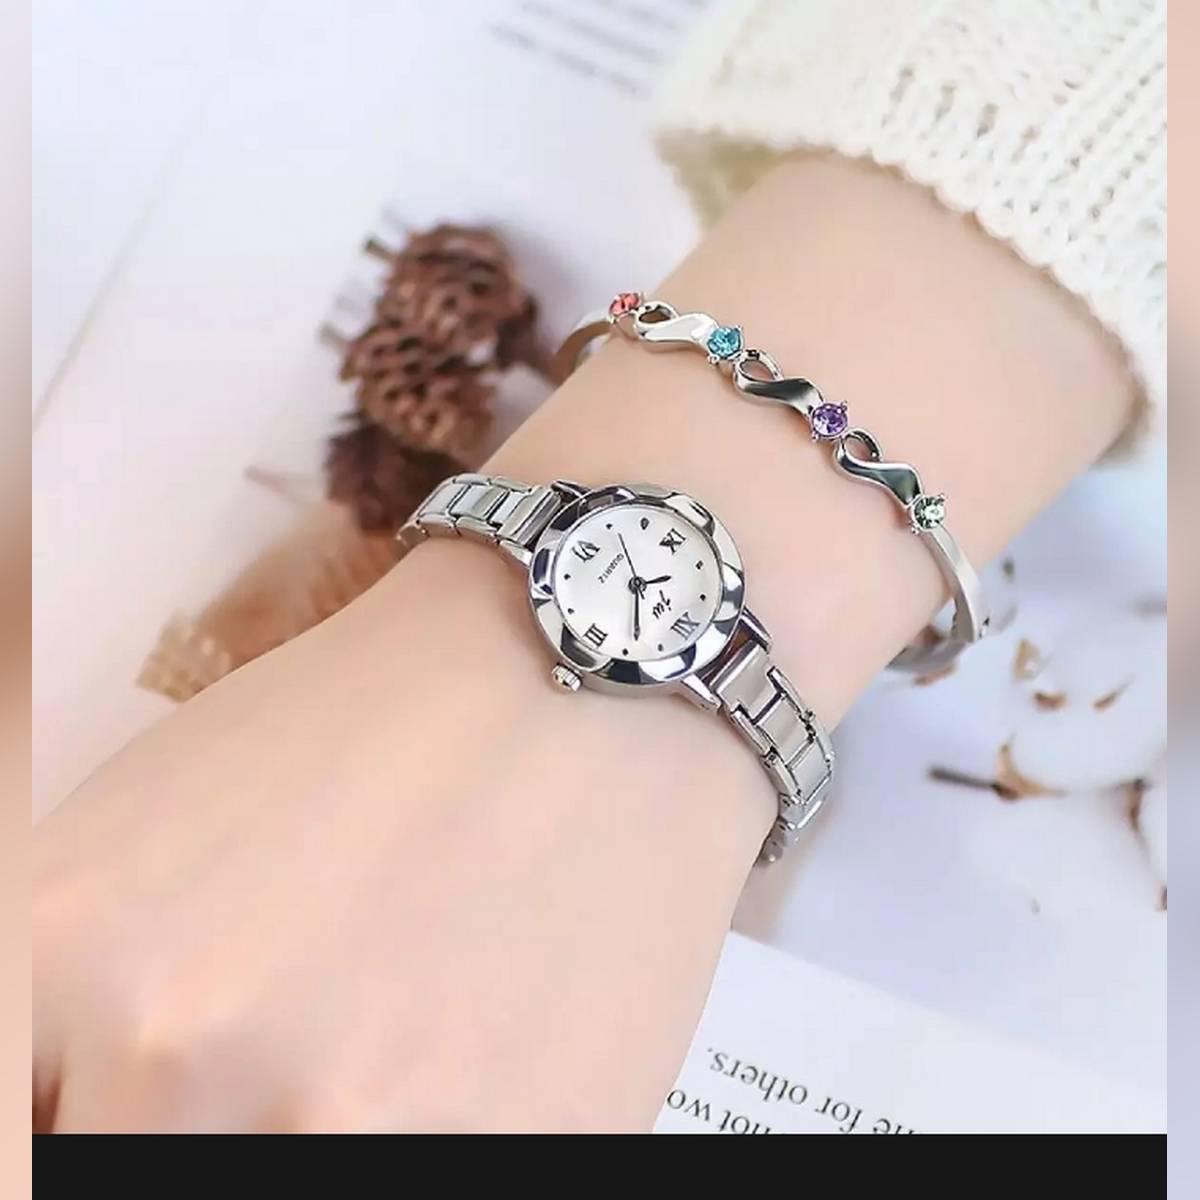 Stylish Fancy Silver Ladies Jewellery Watch